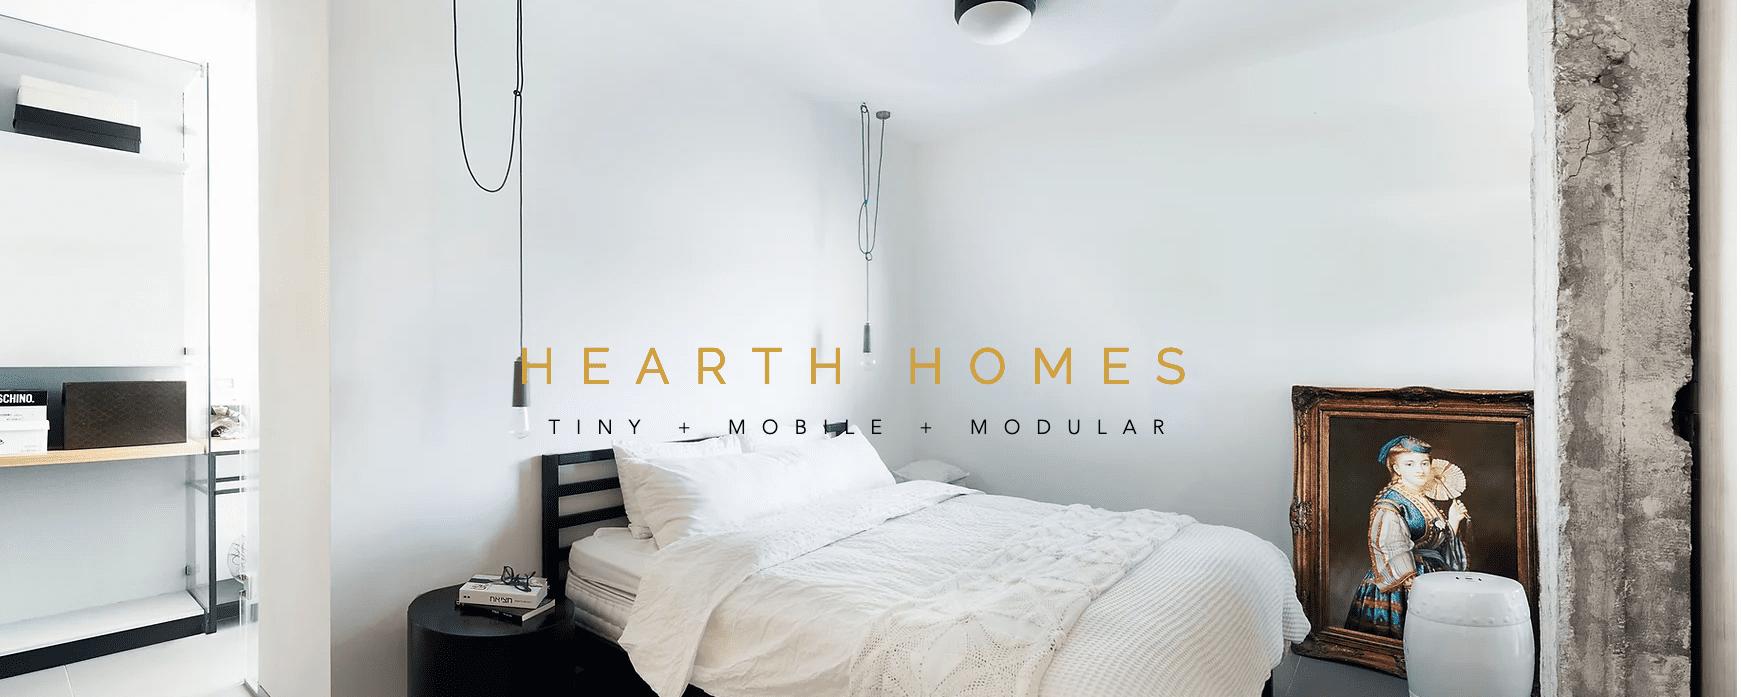 Hearth Homes Co. Joins THIA